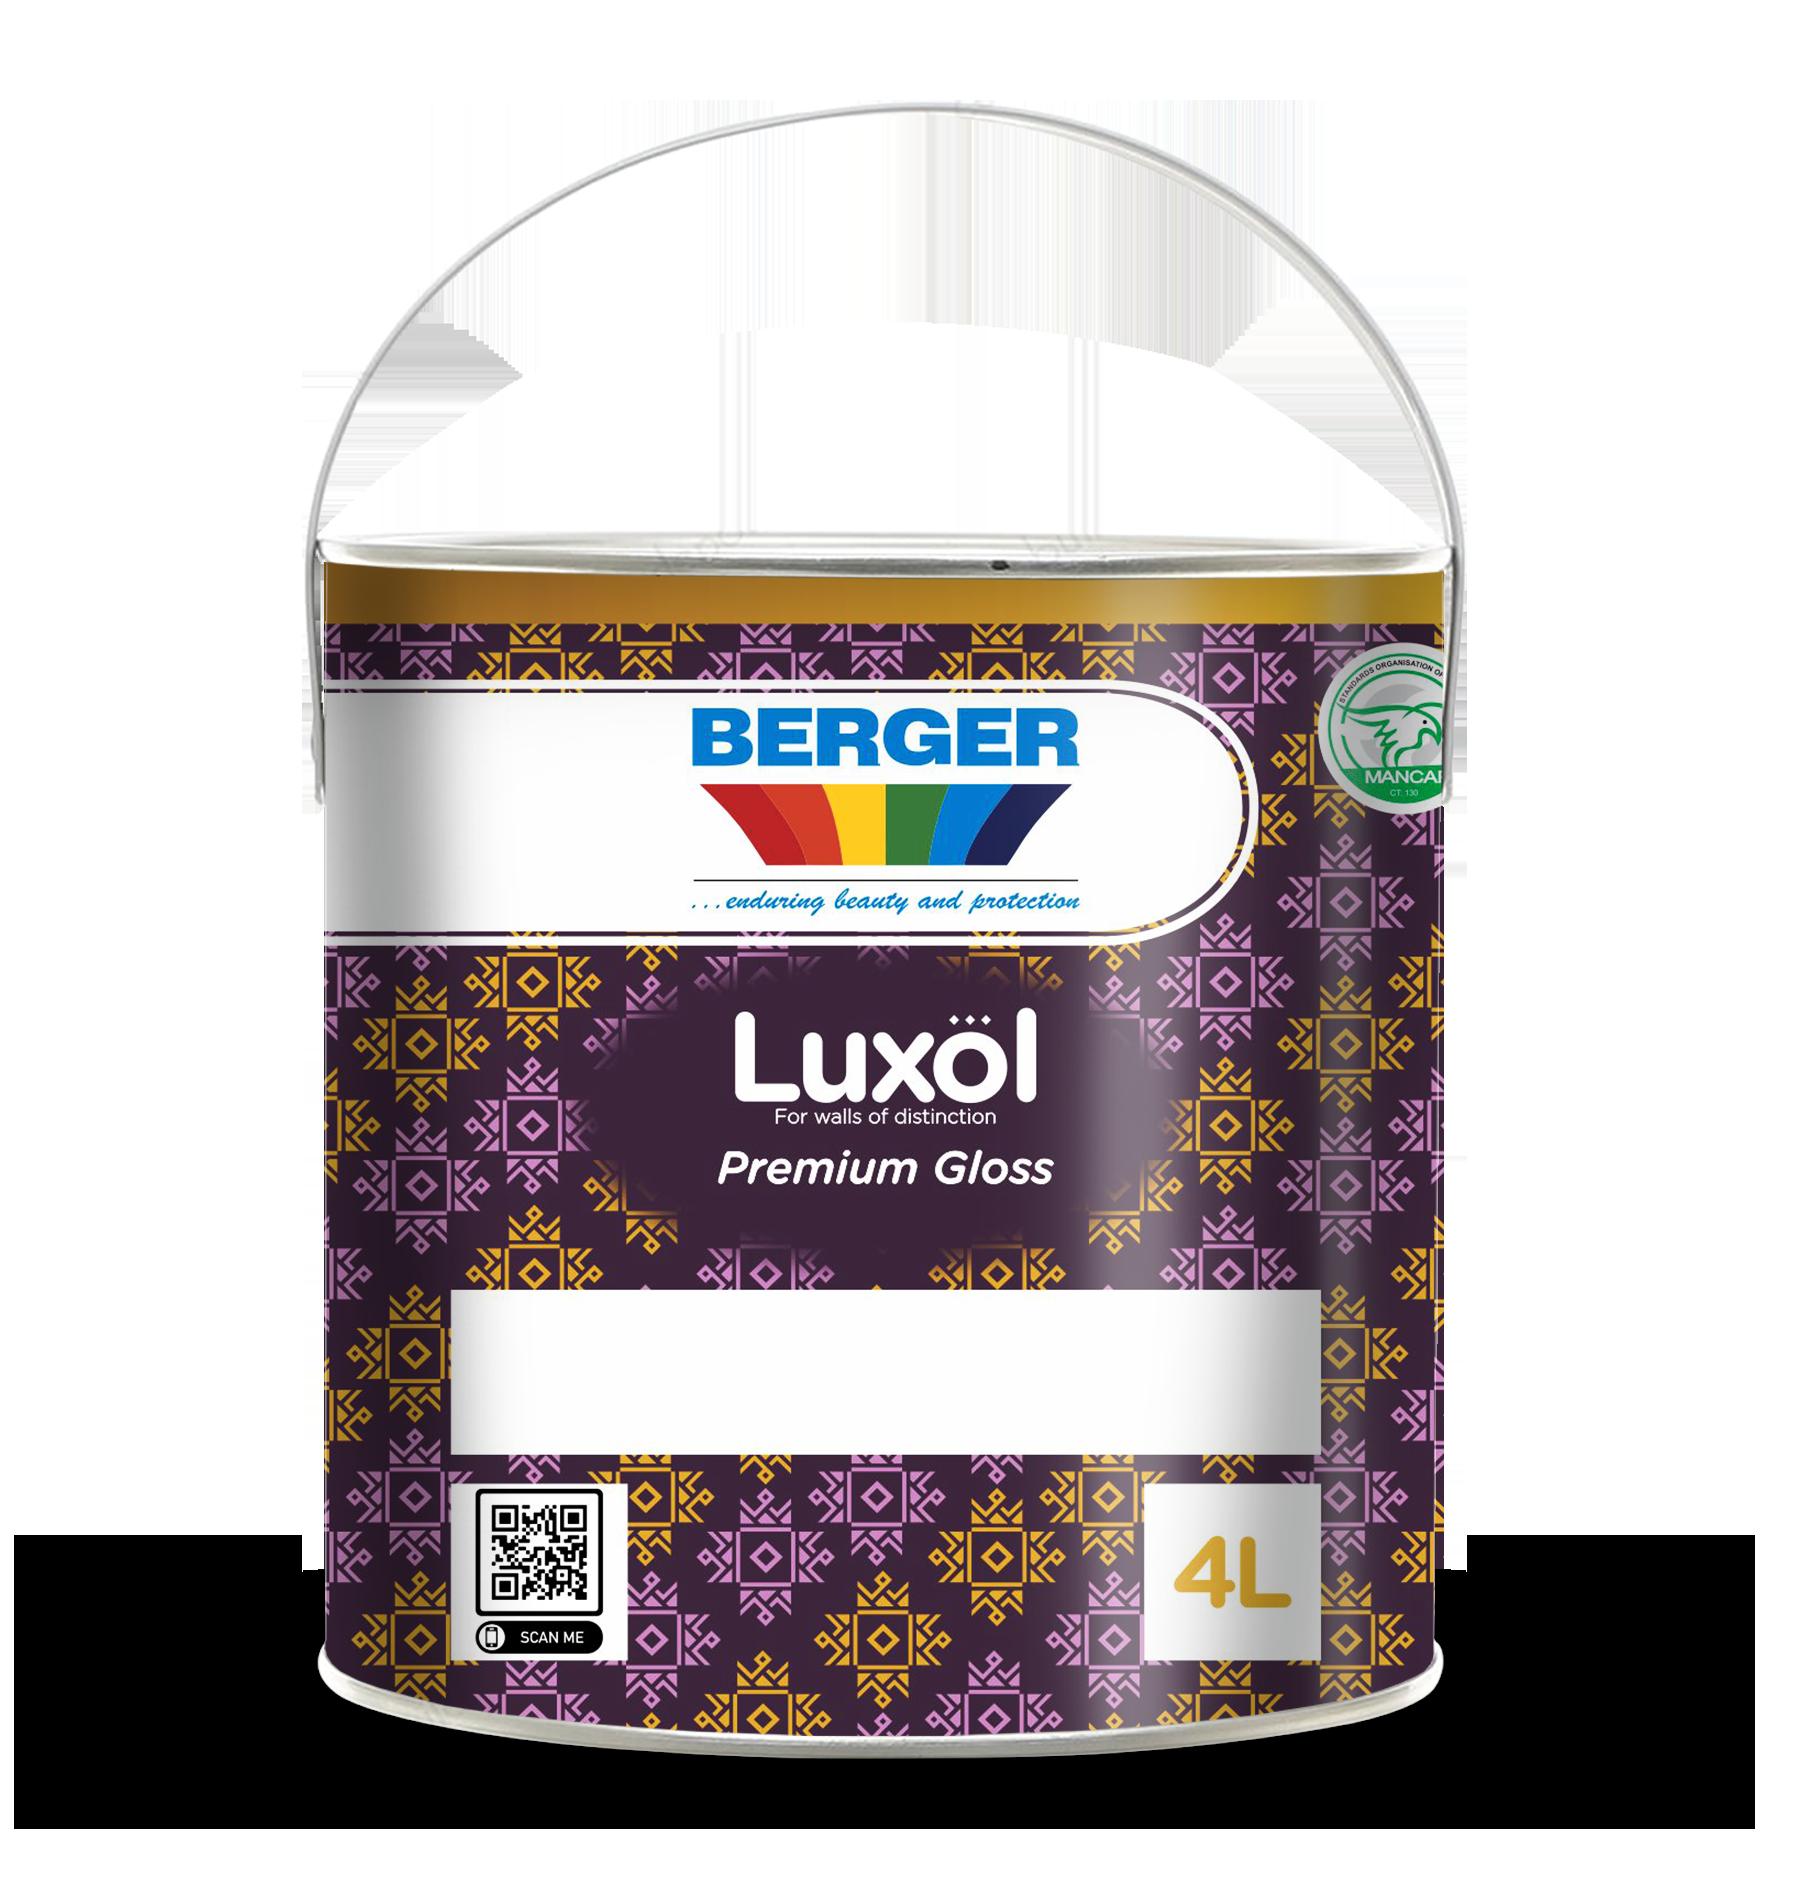 Luxol Gloss